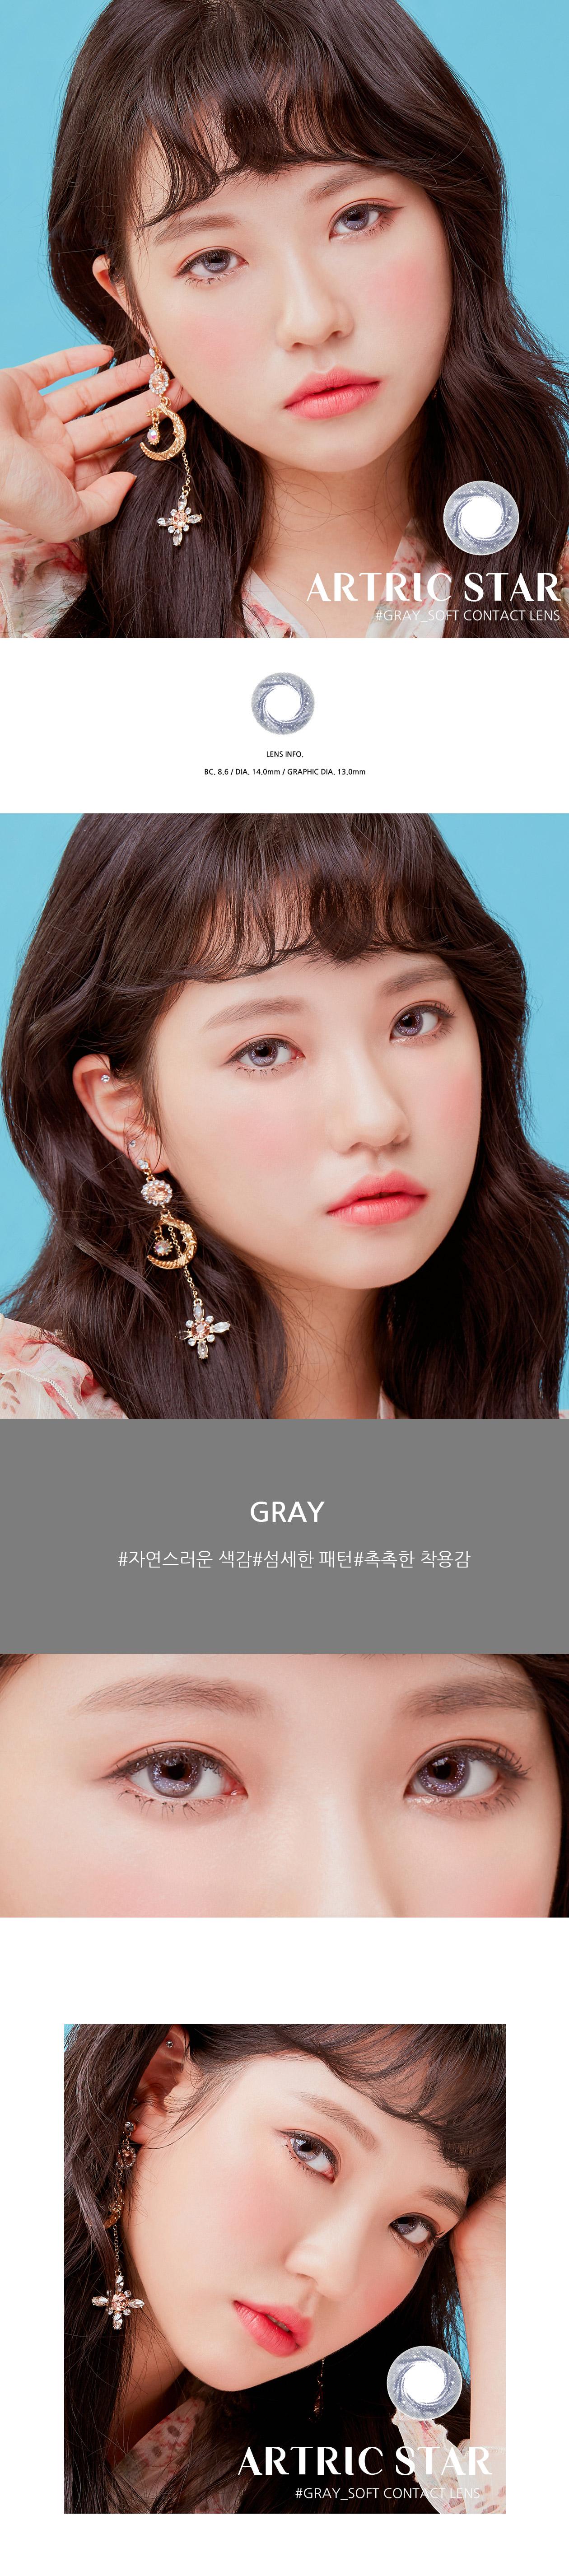 artric-star-gray.jpg